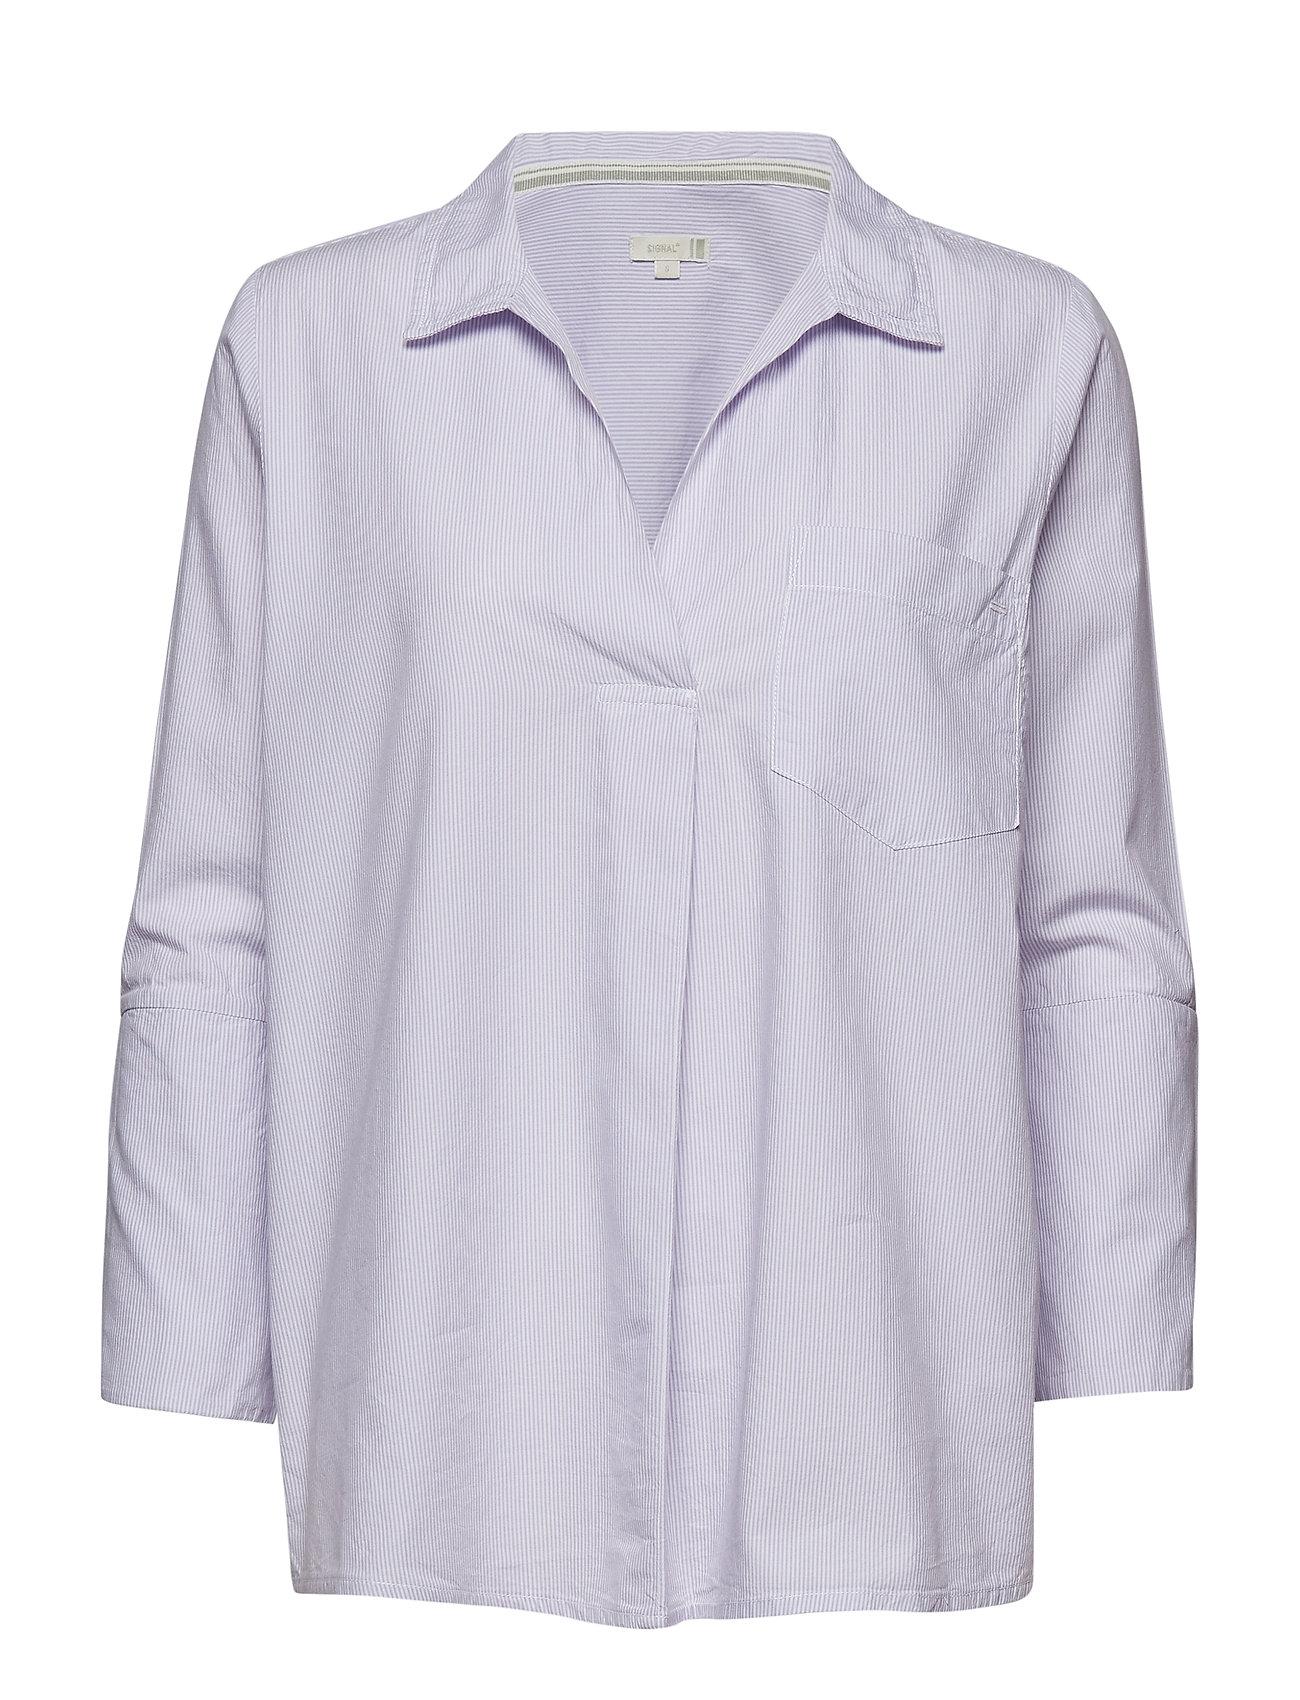 Signal Shirts - LAVENDER